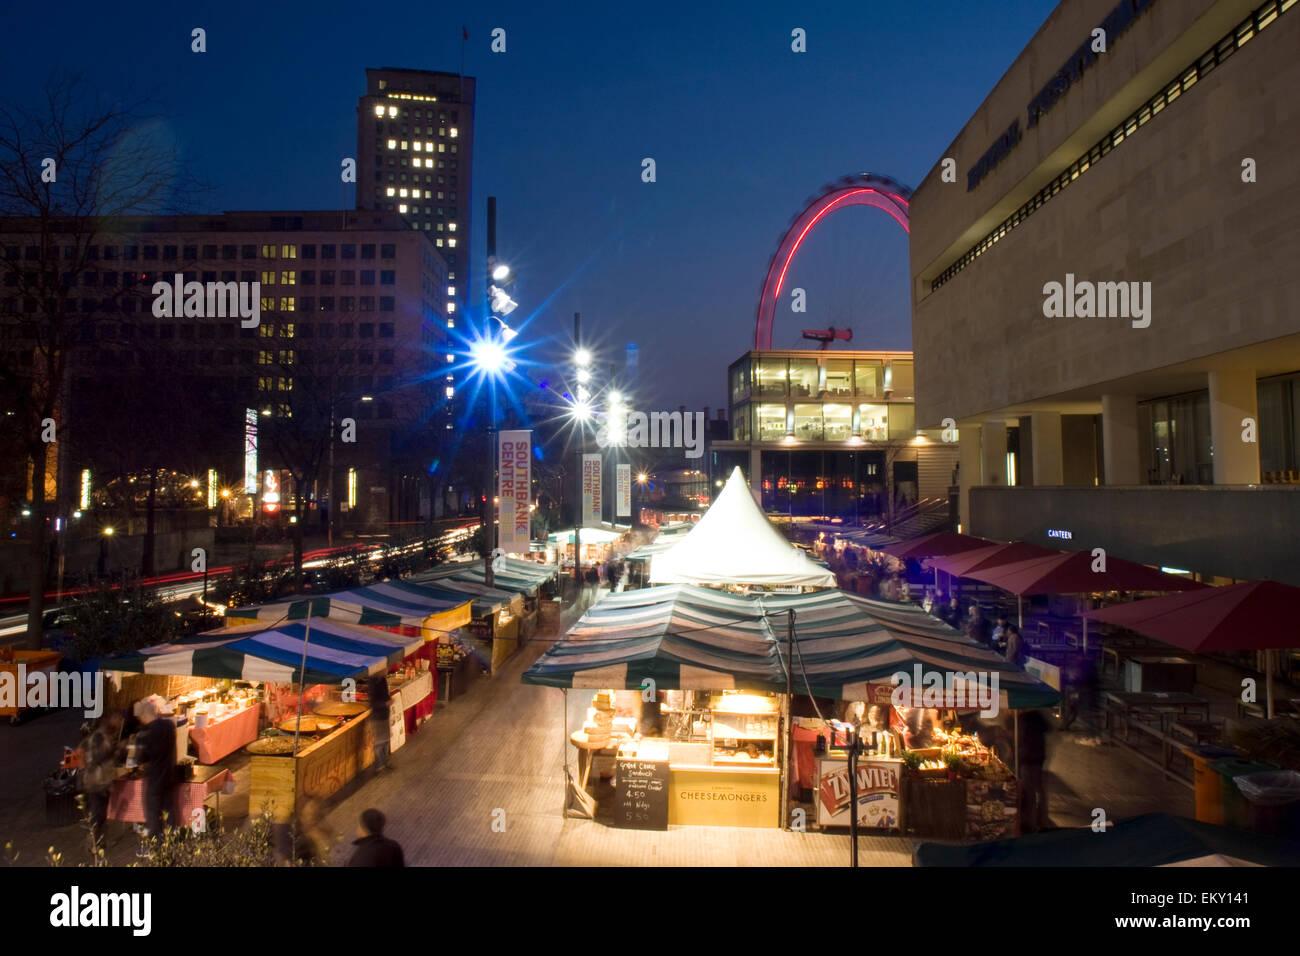 Royal Festival Hall food market, South Bank, London, UK Stock Photo